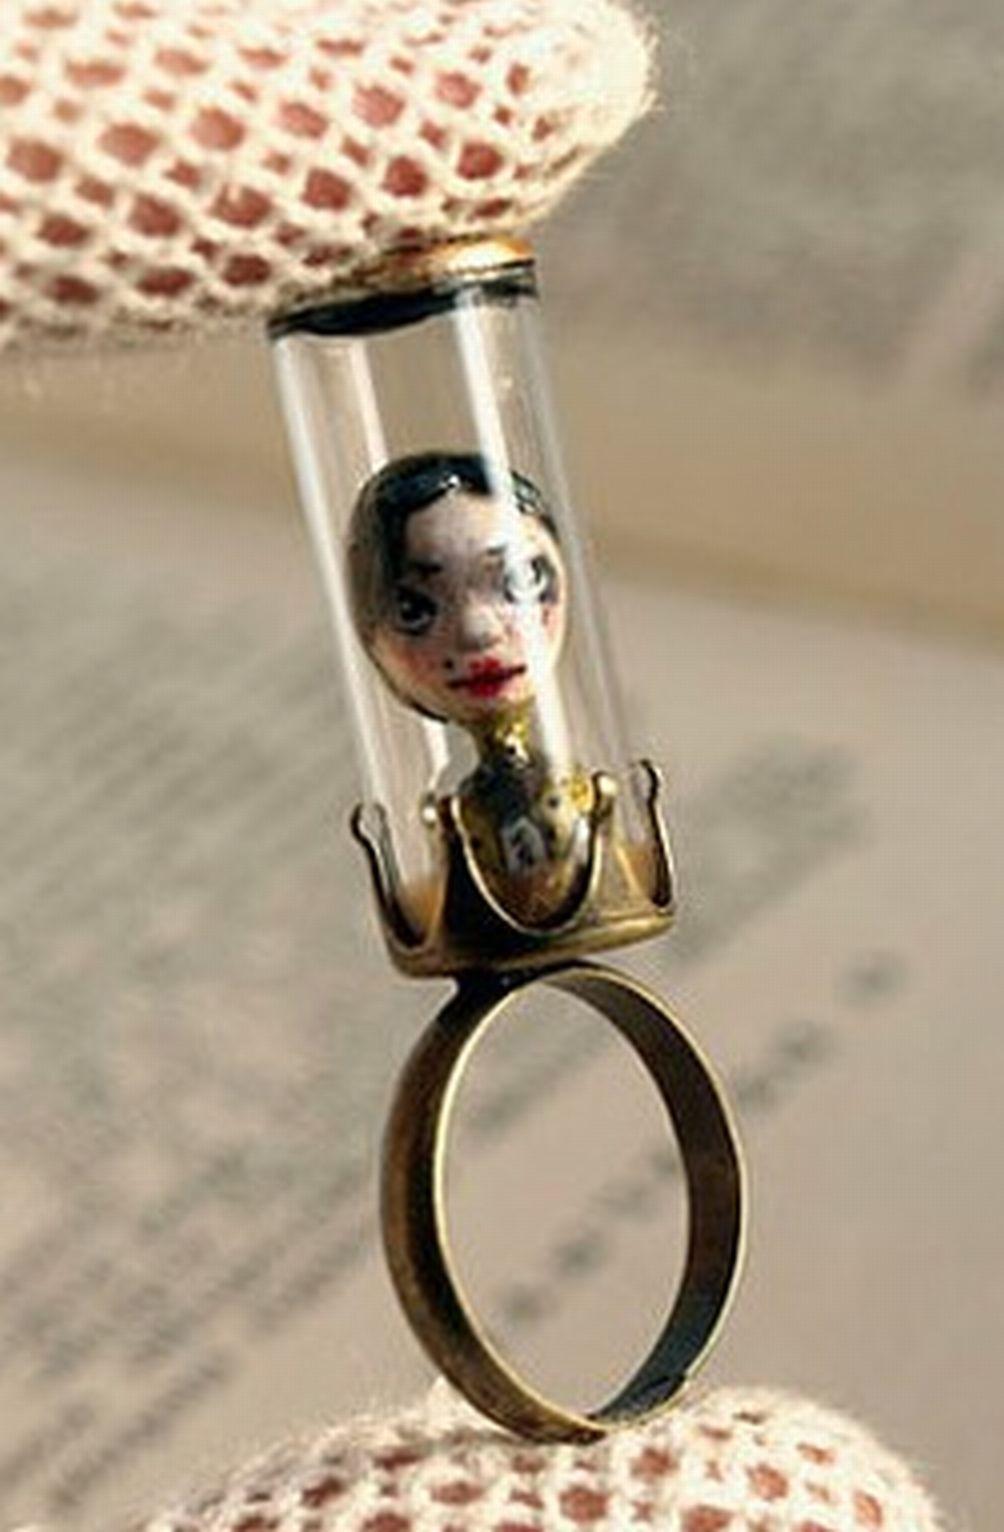 Mini Doll under Glass  Ring  - LOVE!!